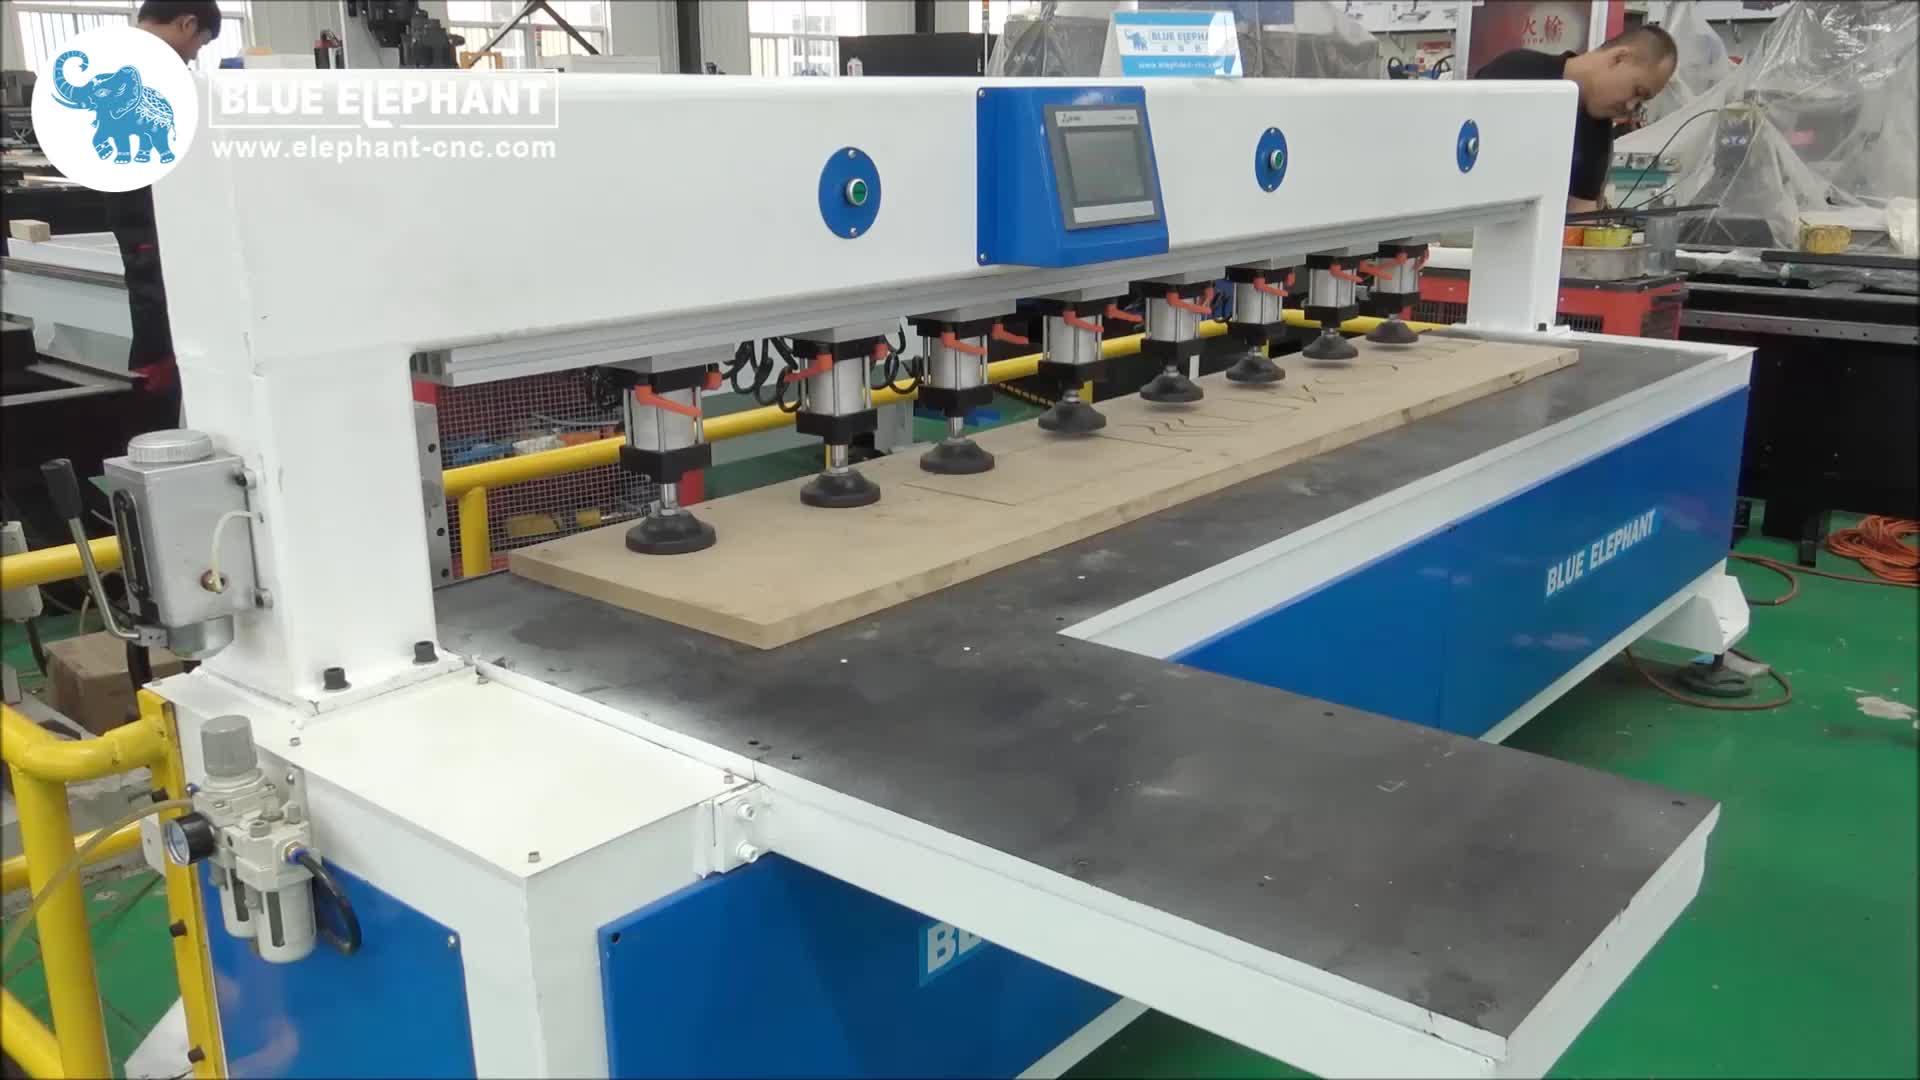 BLUE ELEPHANT ราคาถูกความเร็วสูง CNC ไม้ด้านข้างเครื่องเจาะสำหรับ nesting เฟอร์นิเจอร์การผลิต